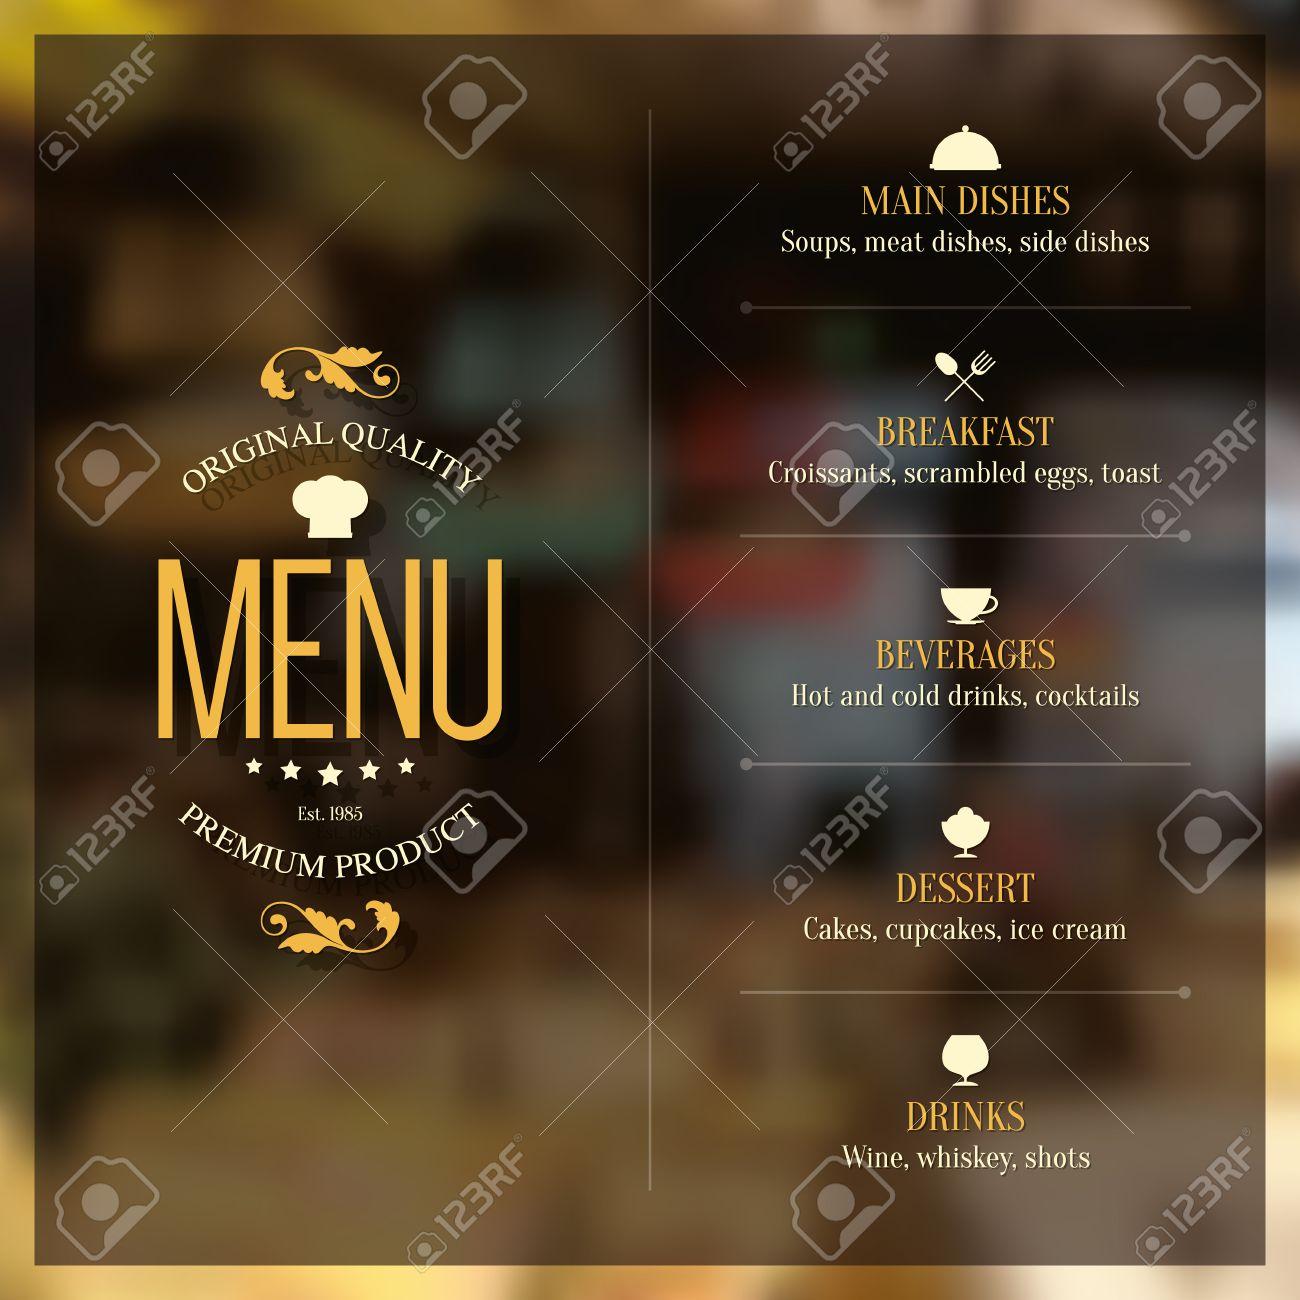 Restaurant menu design. Vector brochure template for cafe, coffee house, restaurant, bar. Food and drinks logotype symbol design. Vintage background - 64319392